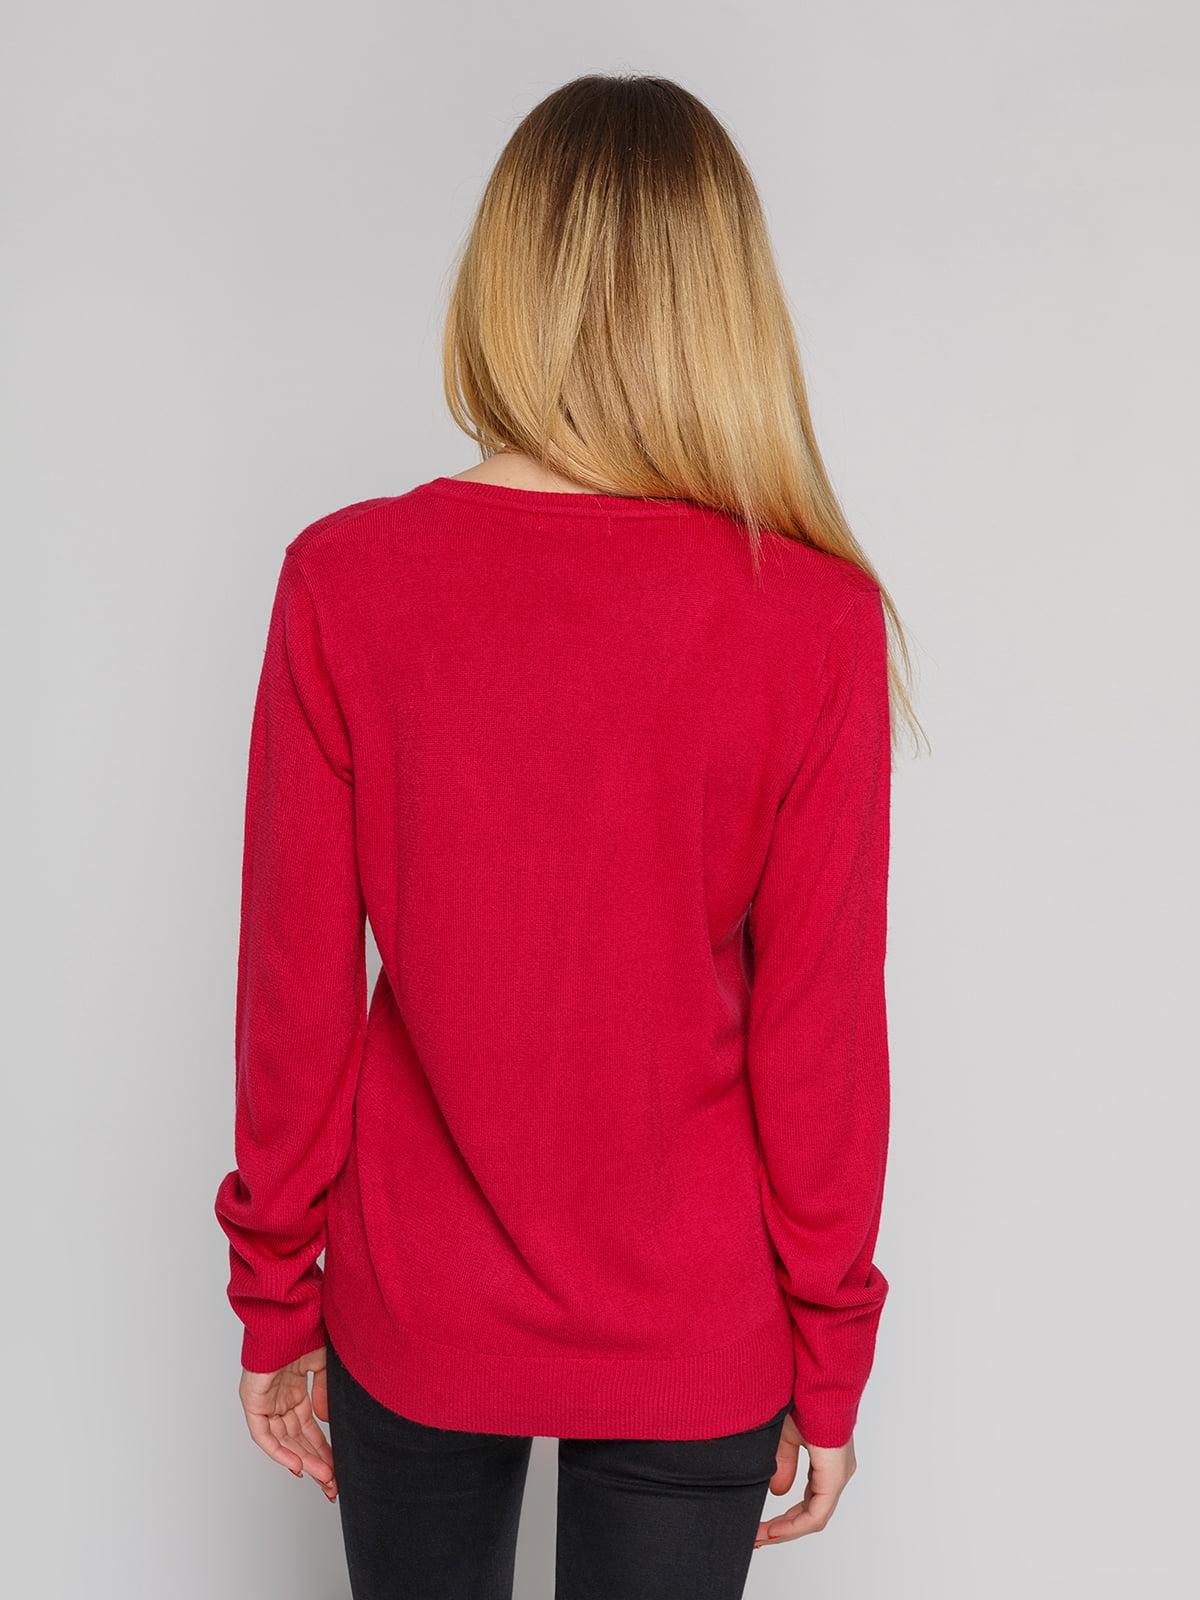 Кофта бордово-малиновая | 4855286 | фото 2